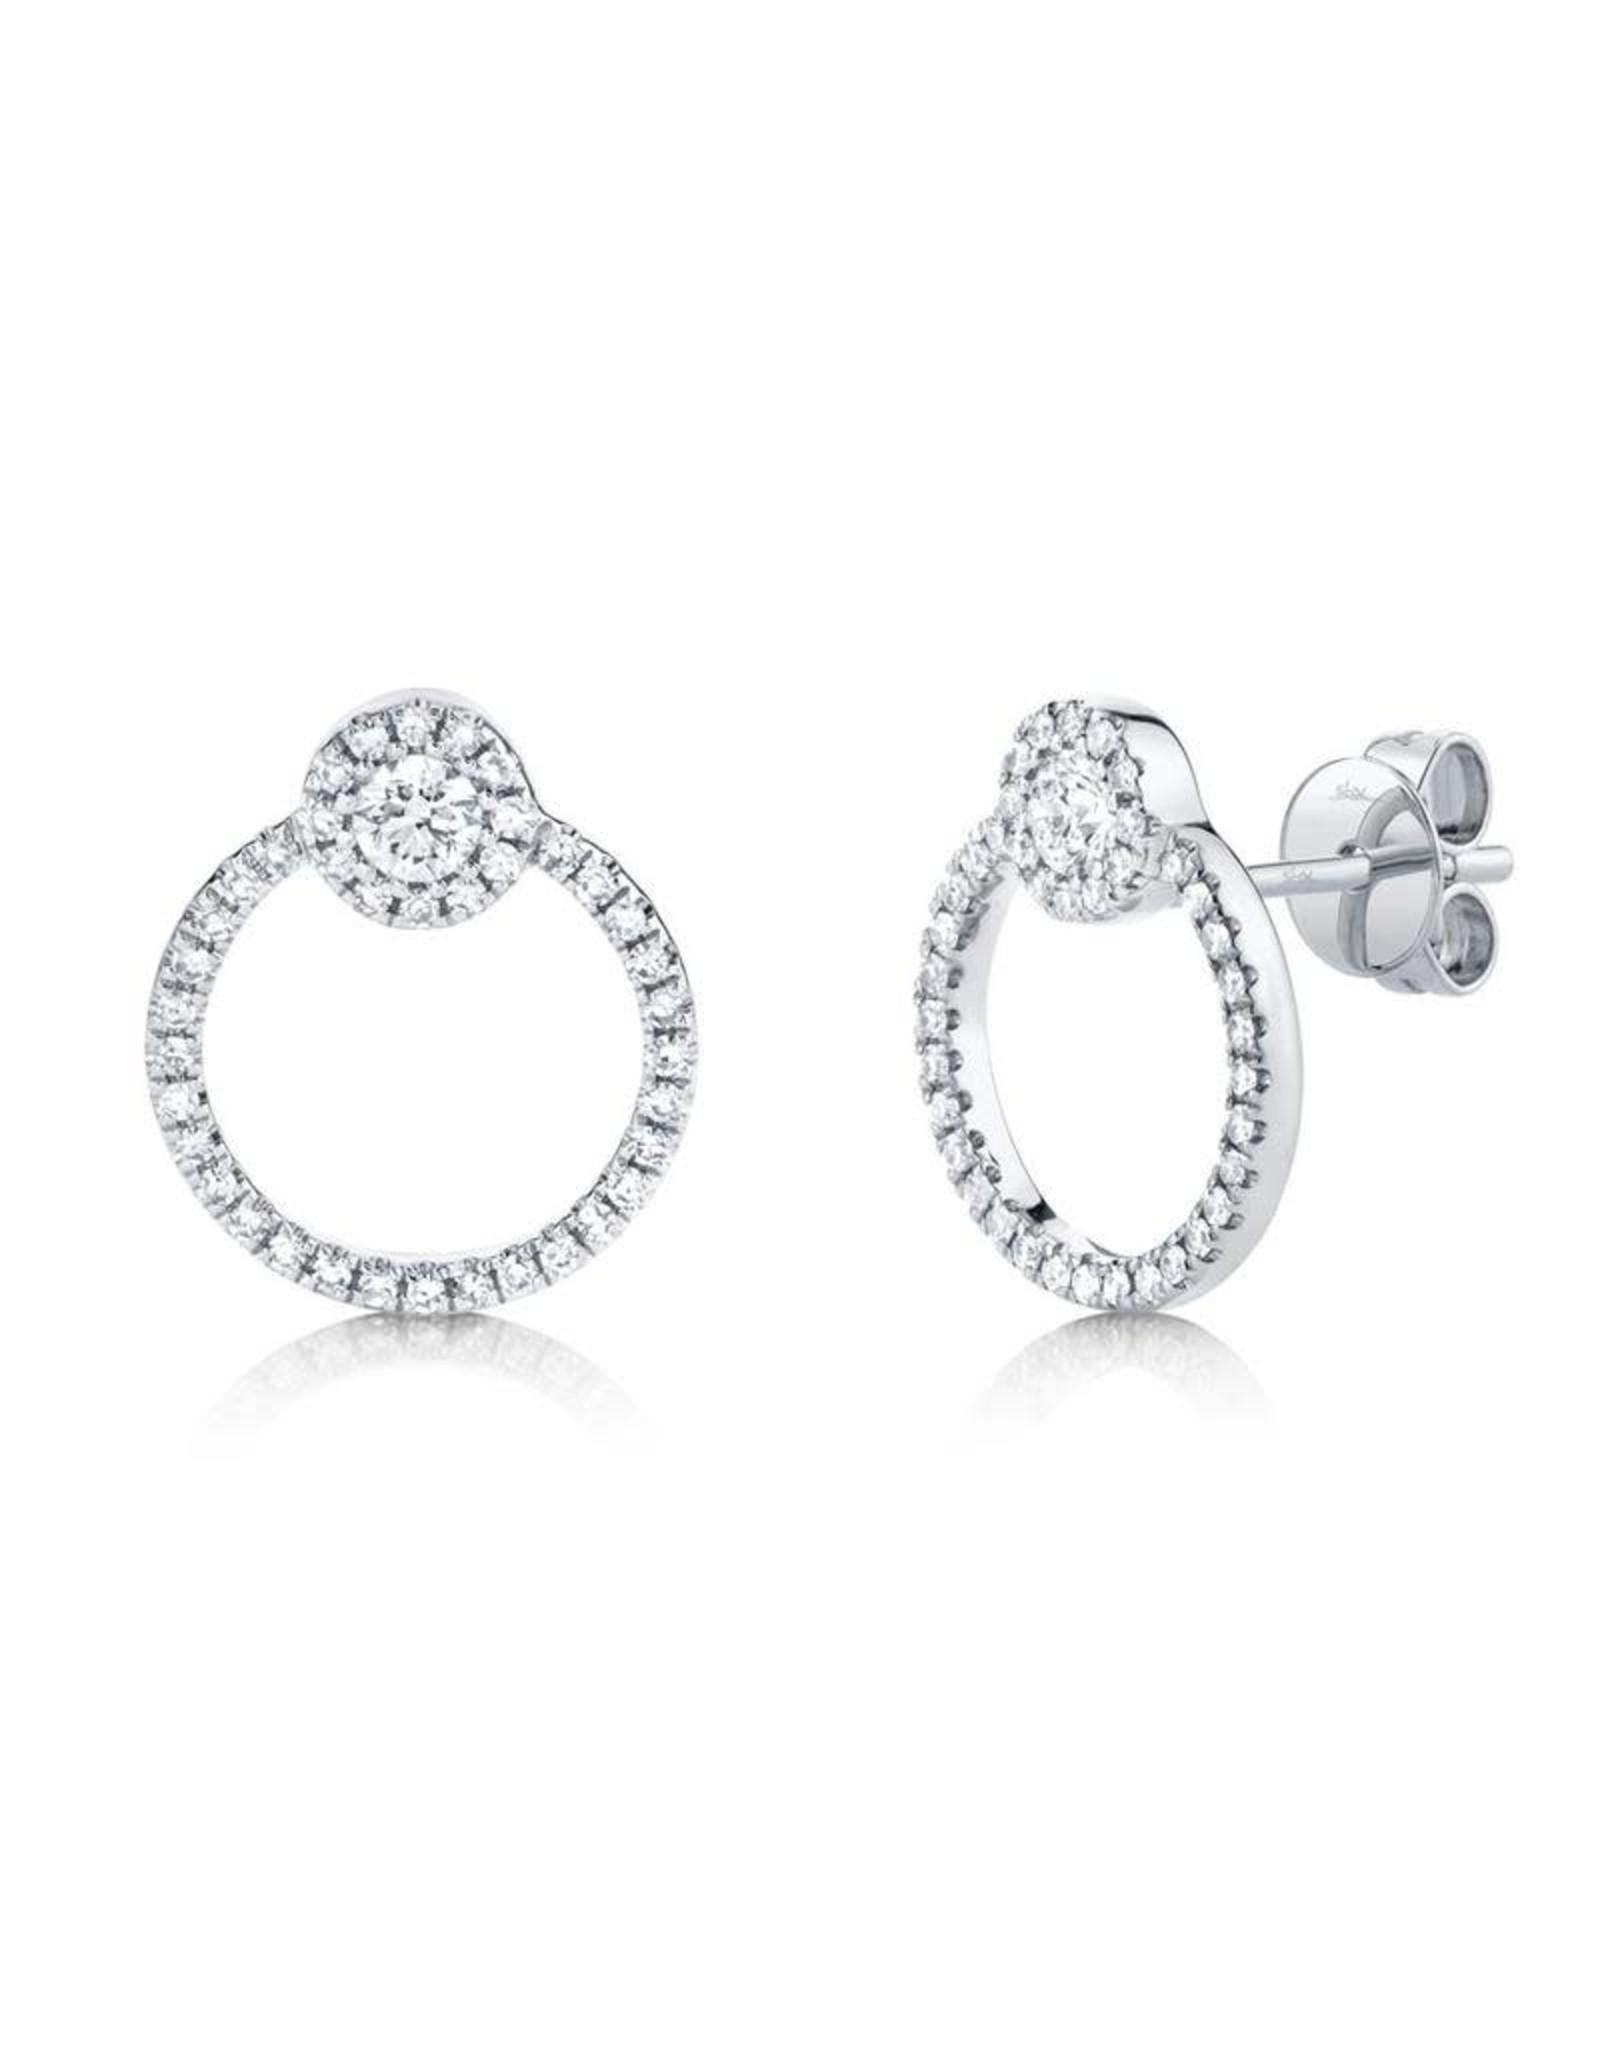 14K White Gold Modern Diamond Doorknocker Stud Earrings, D: 0.39ct